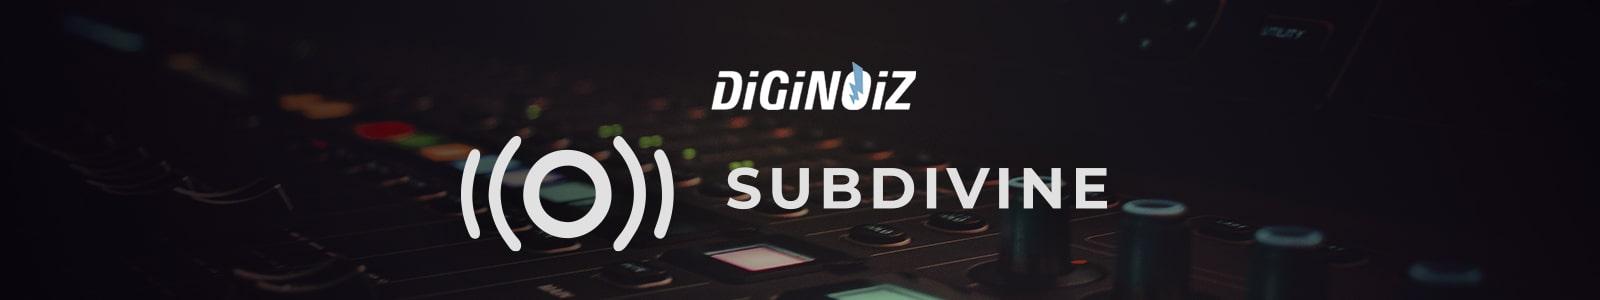 subdivine by diginoiz